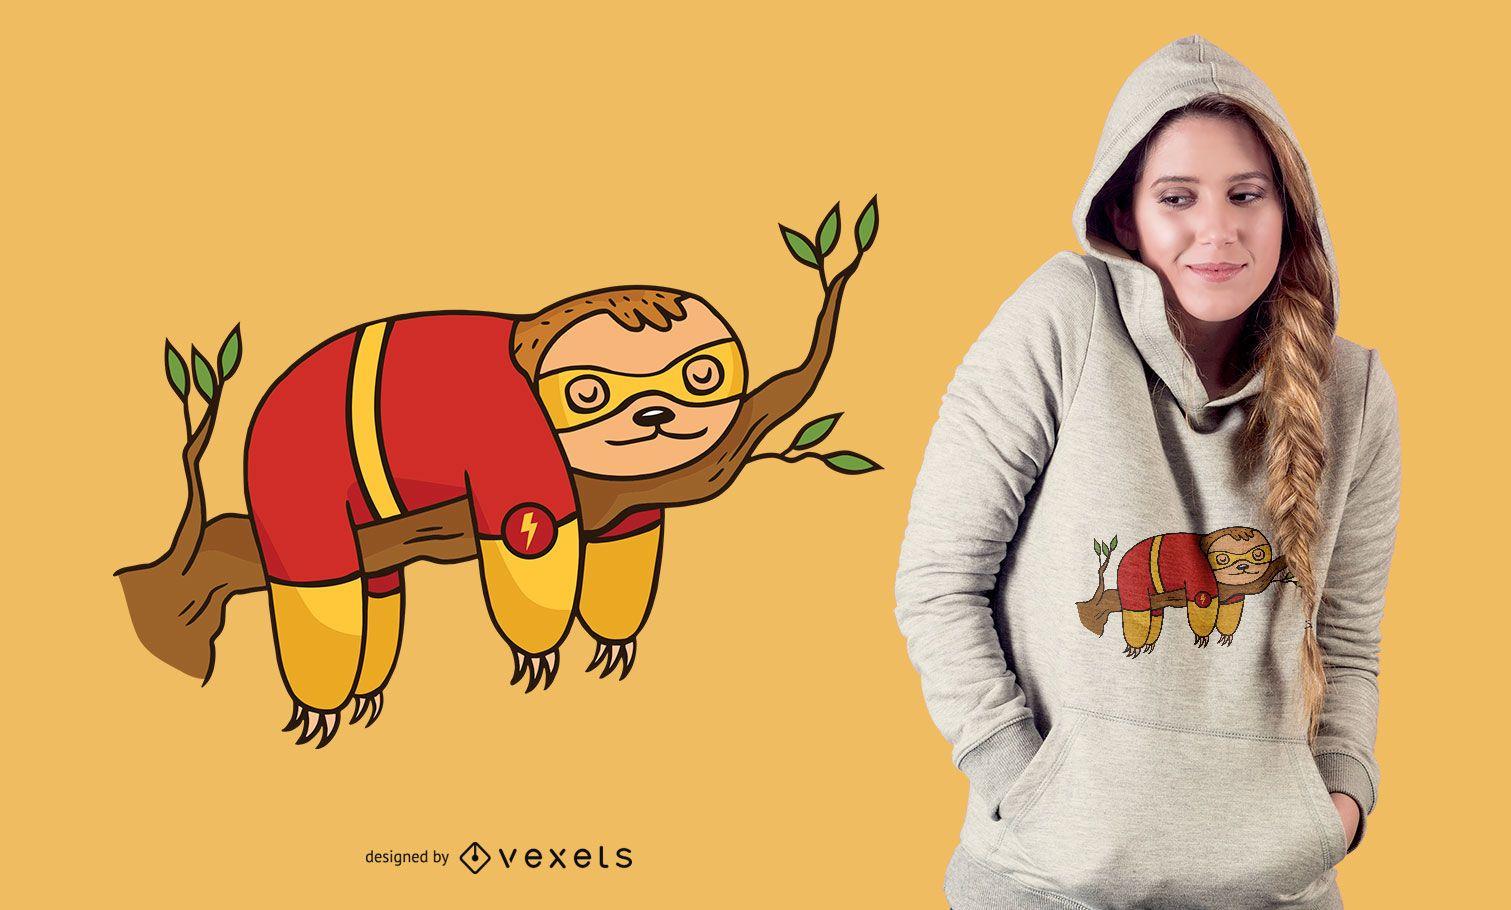 Superhero sloth t-shirt design